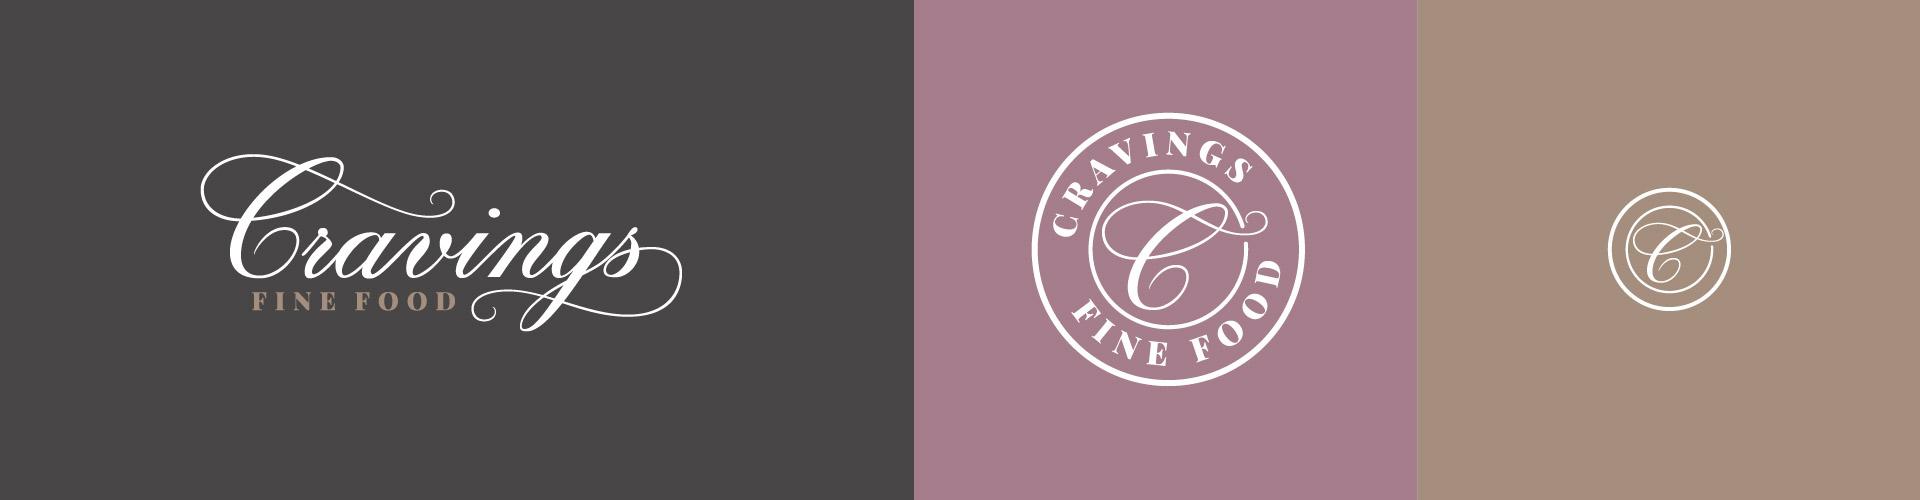 cravings fine food logo variations